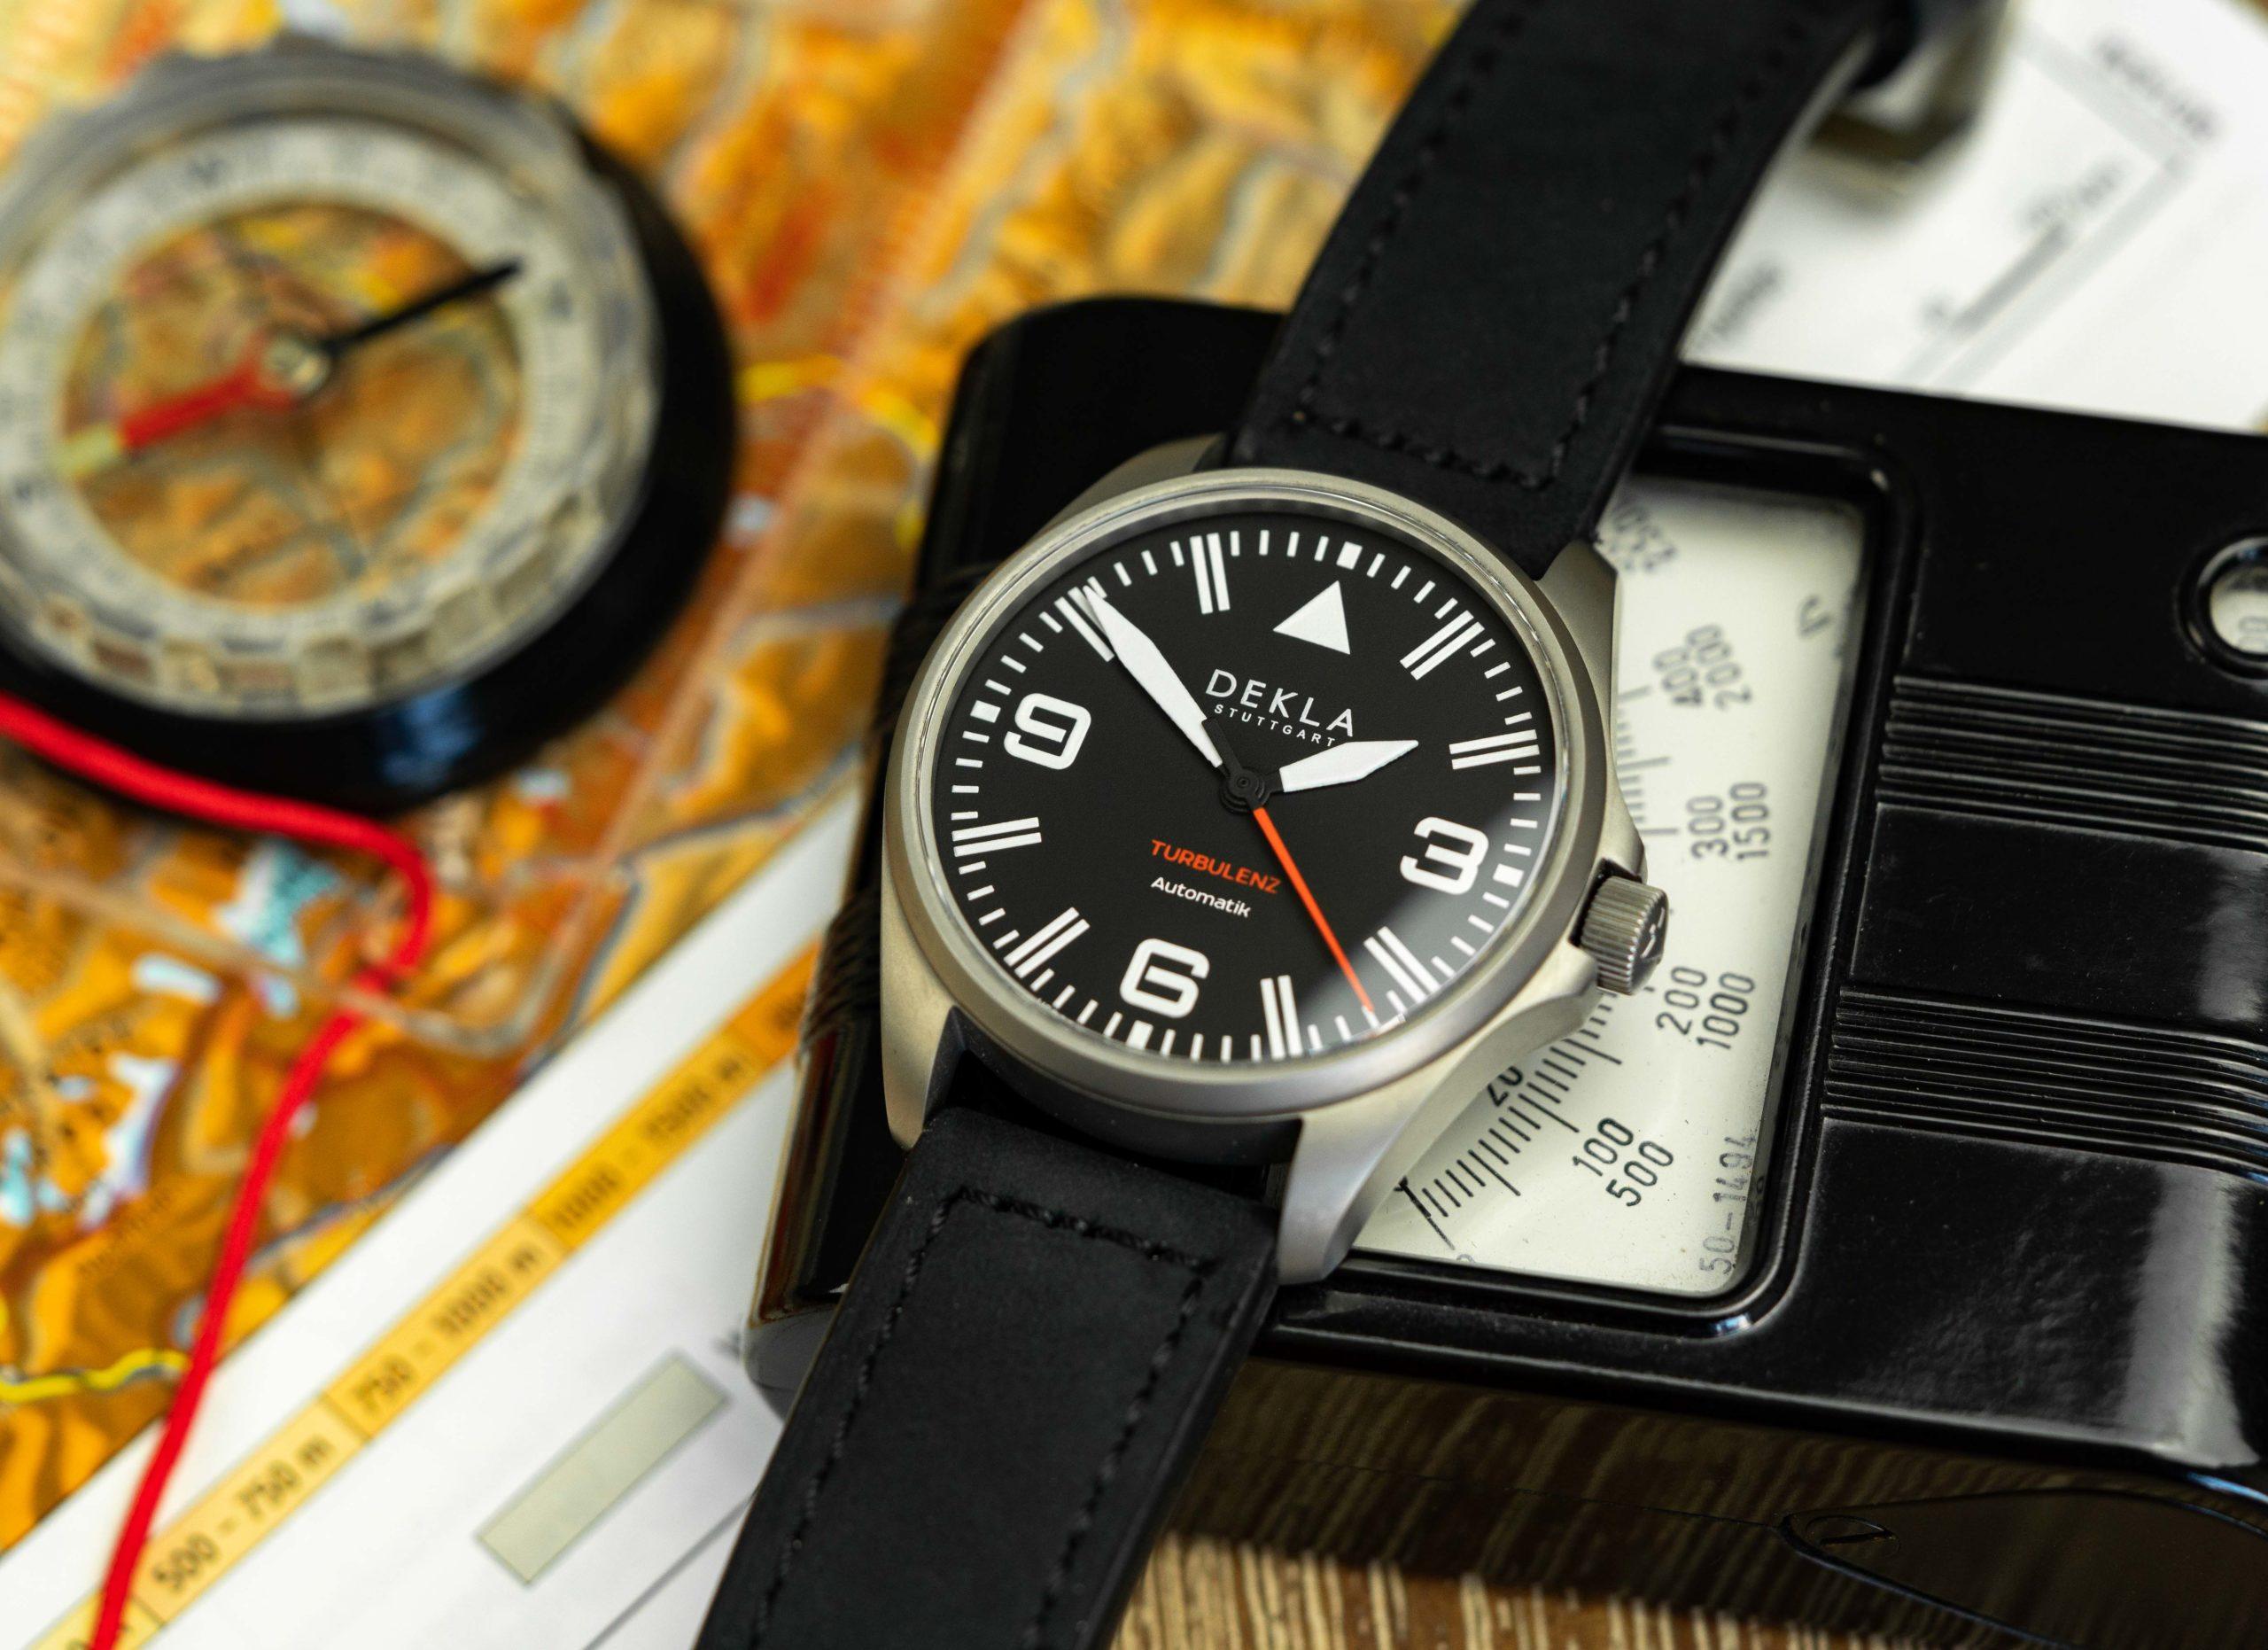 Dekla-Uhren-Test-21